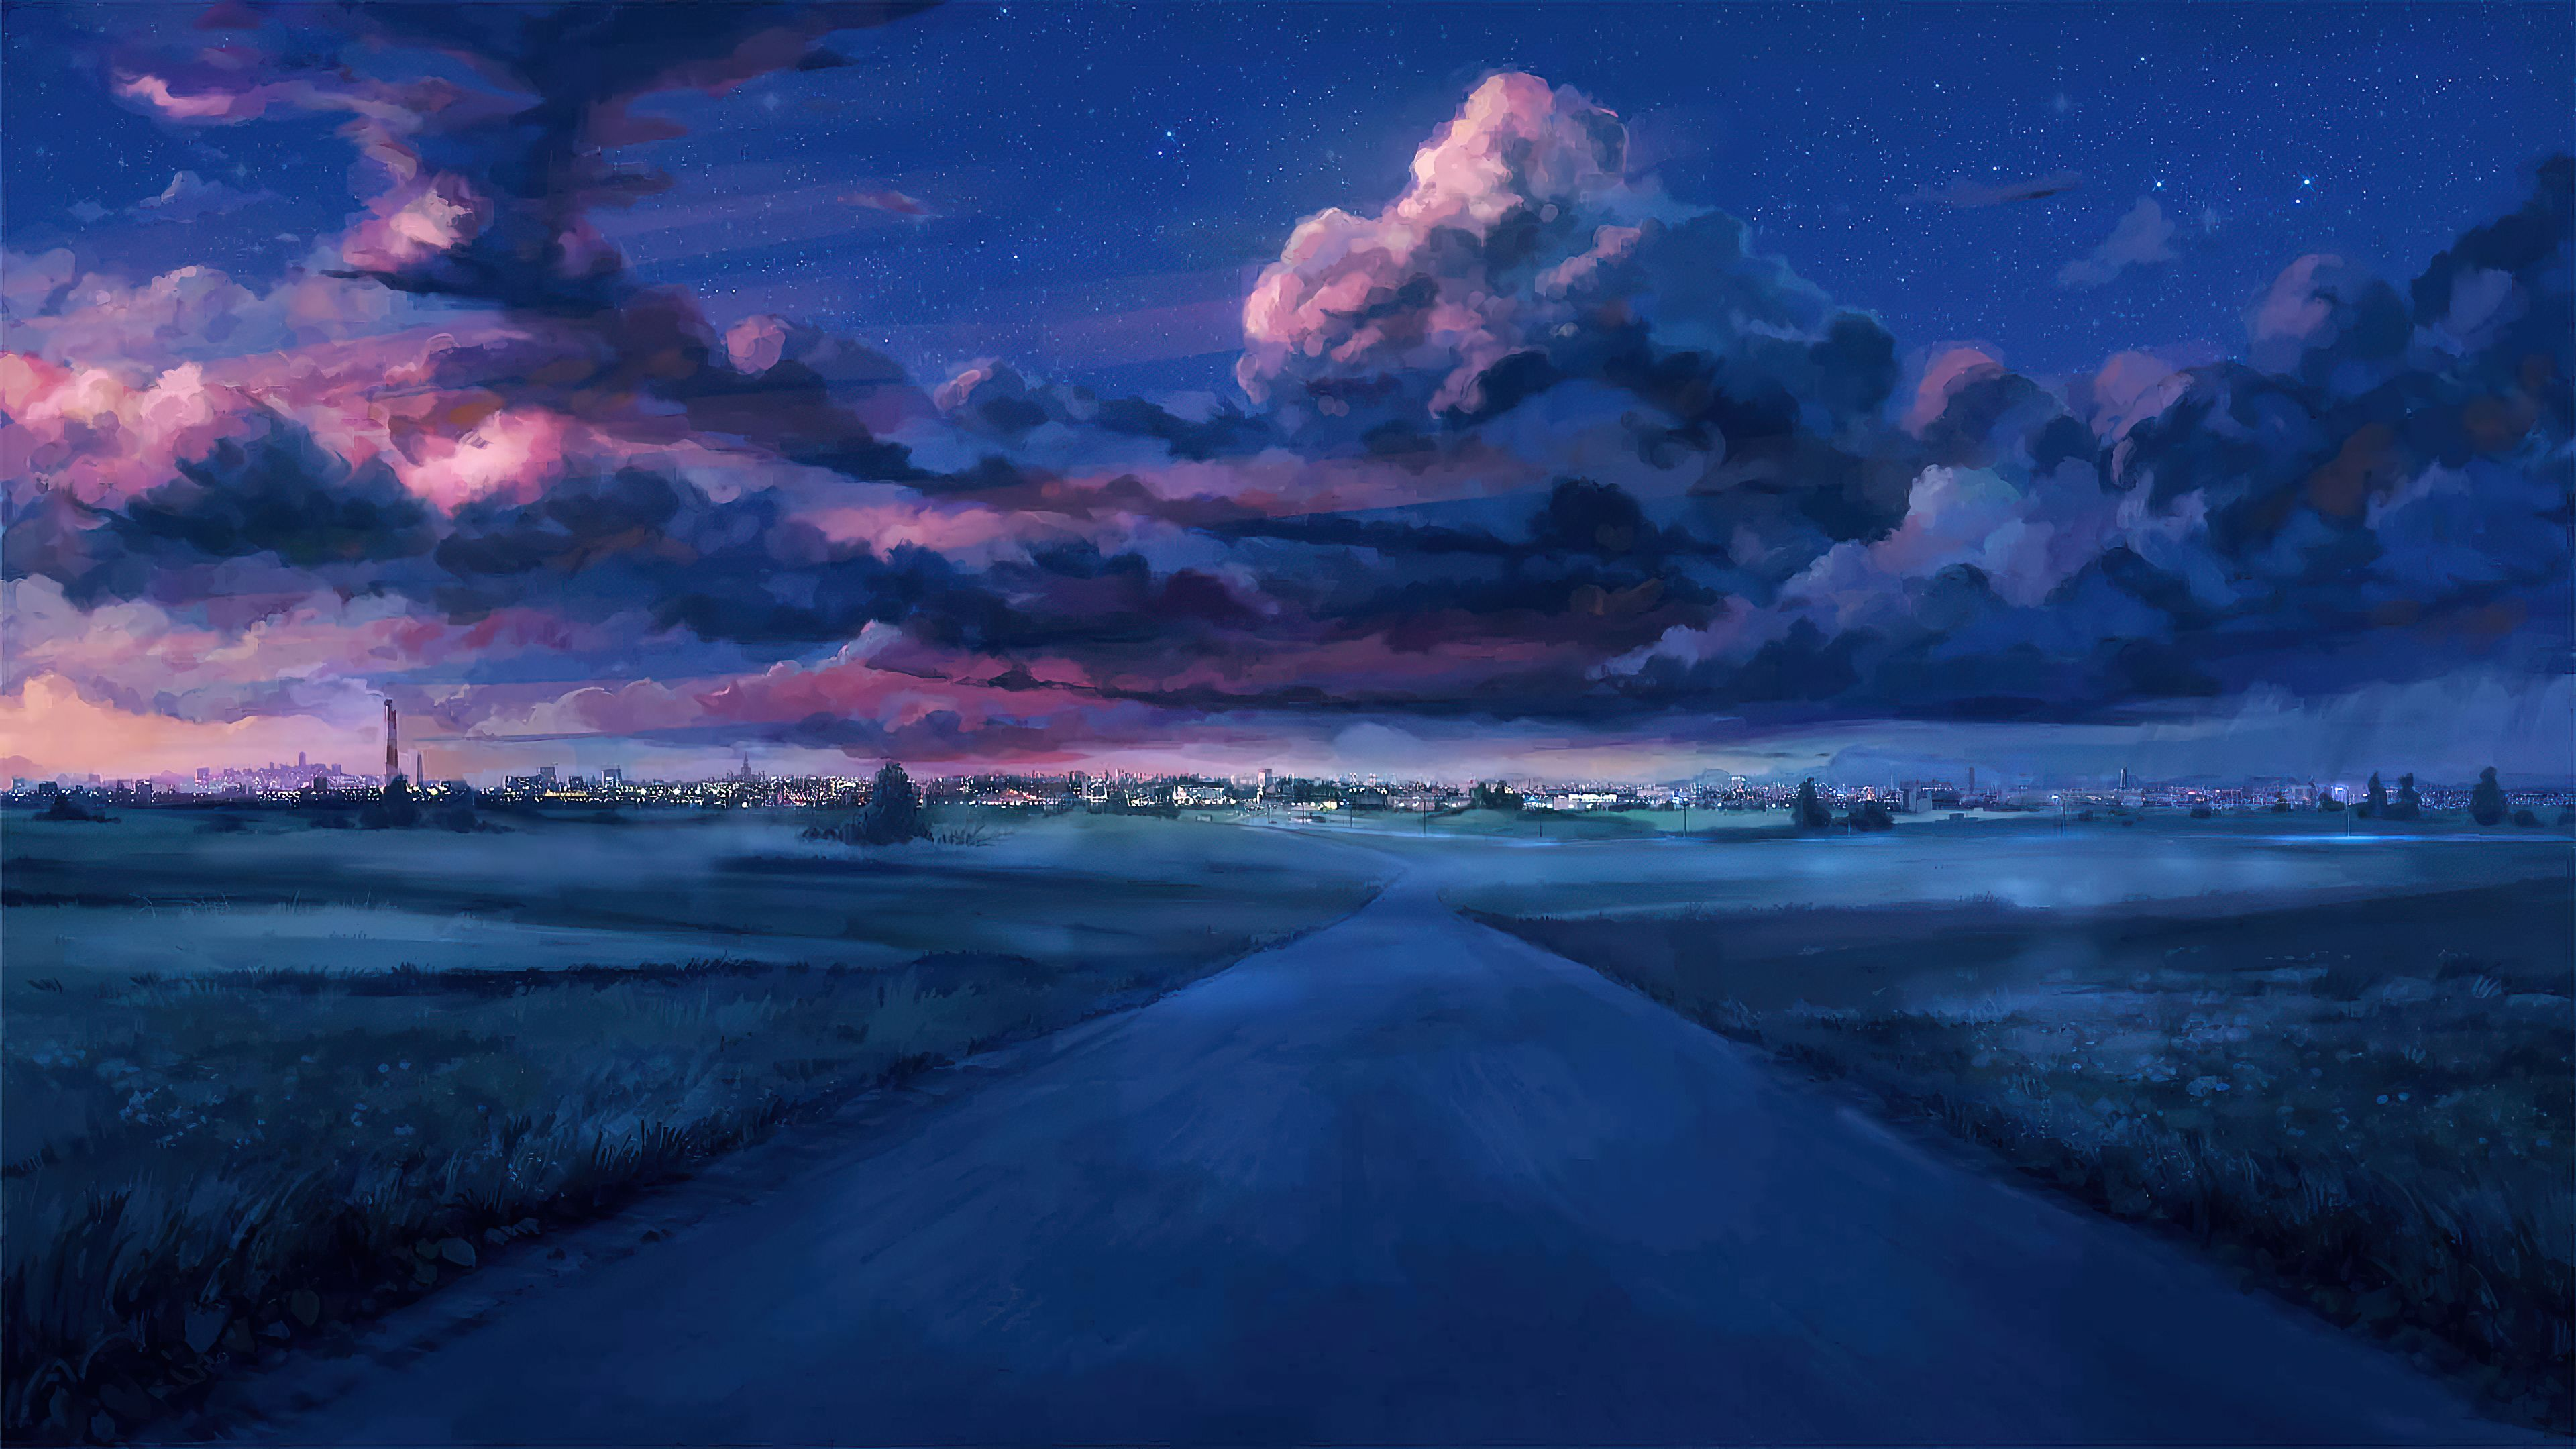 Anime Road To City Everlasting Summer Night Scenery Scenery Background Night Landscape